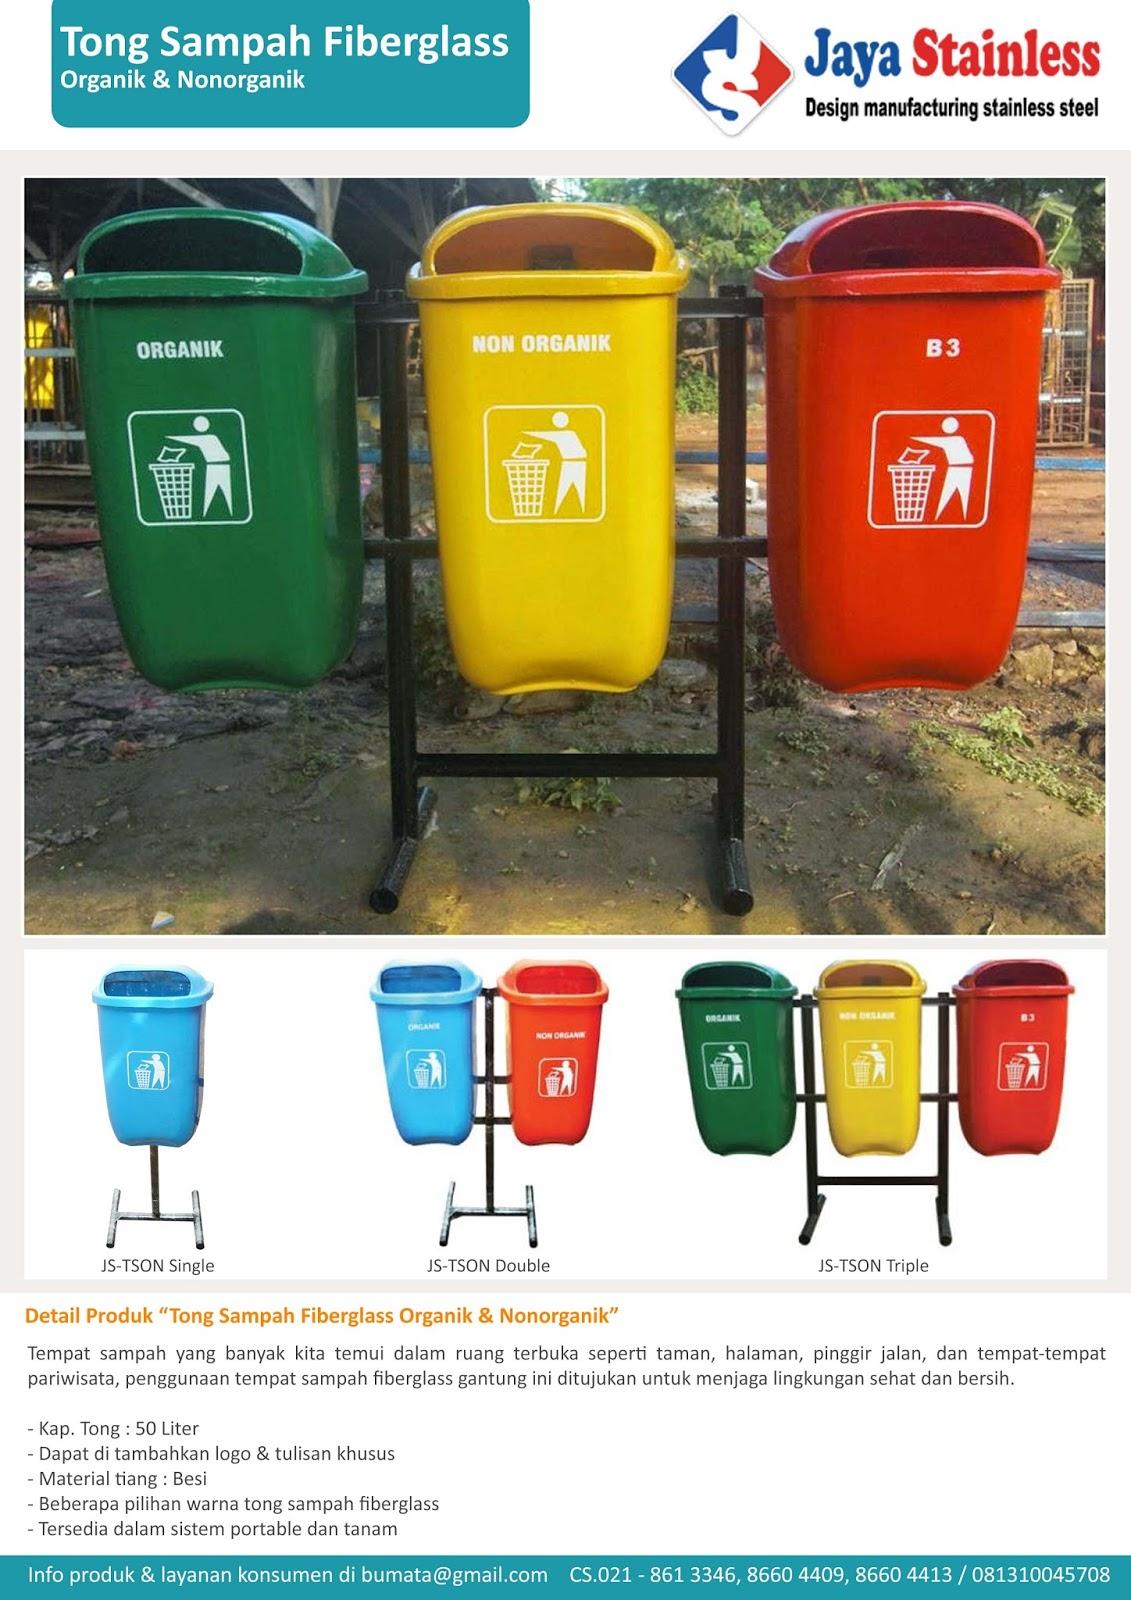 Katalog tempat sampah fiberglass